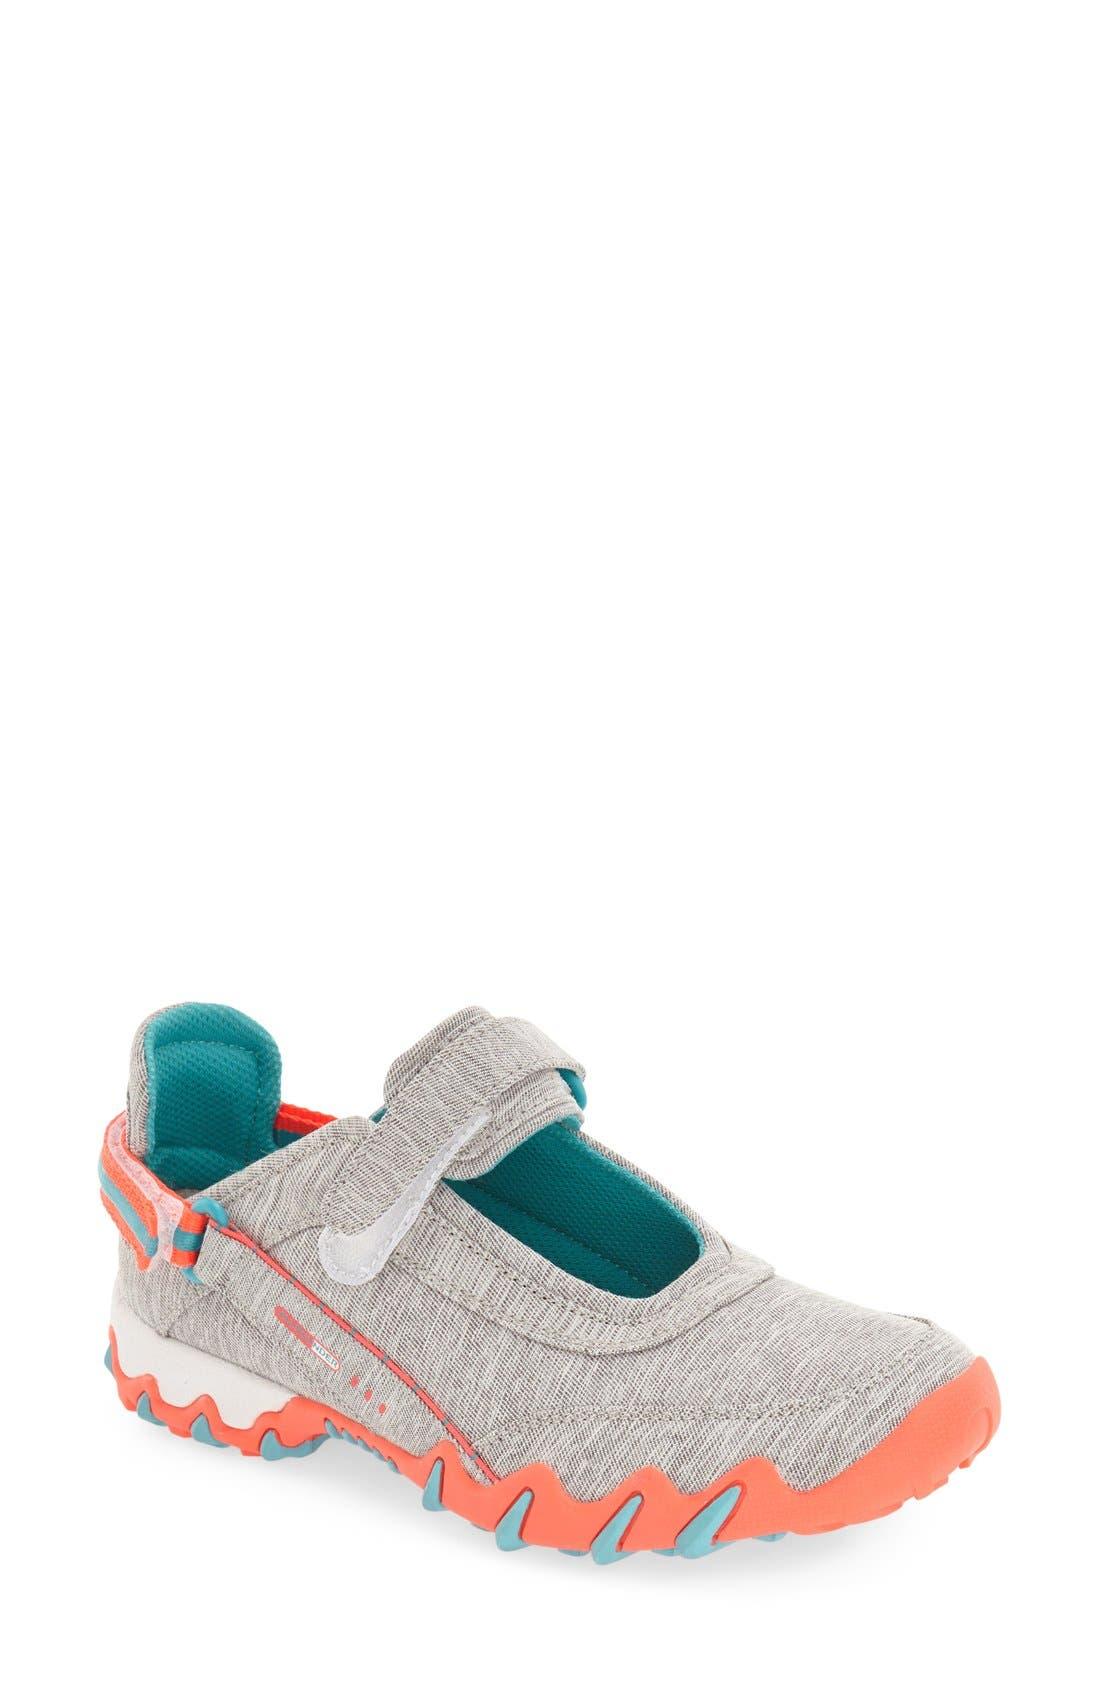 Alternate Image 1 Selected - Allrounder by Mephisto 'Niro' Mary Jane Sneaker (Women)